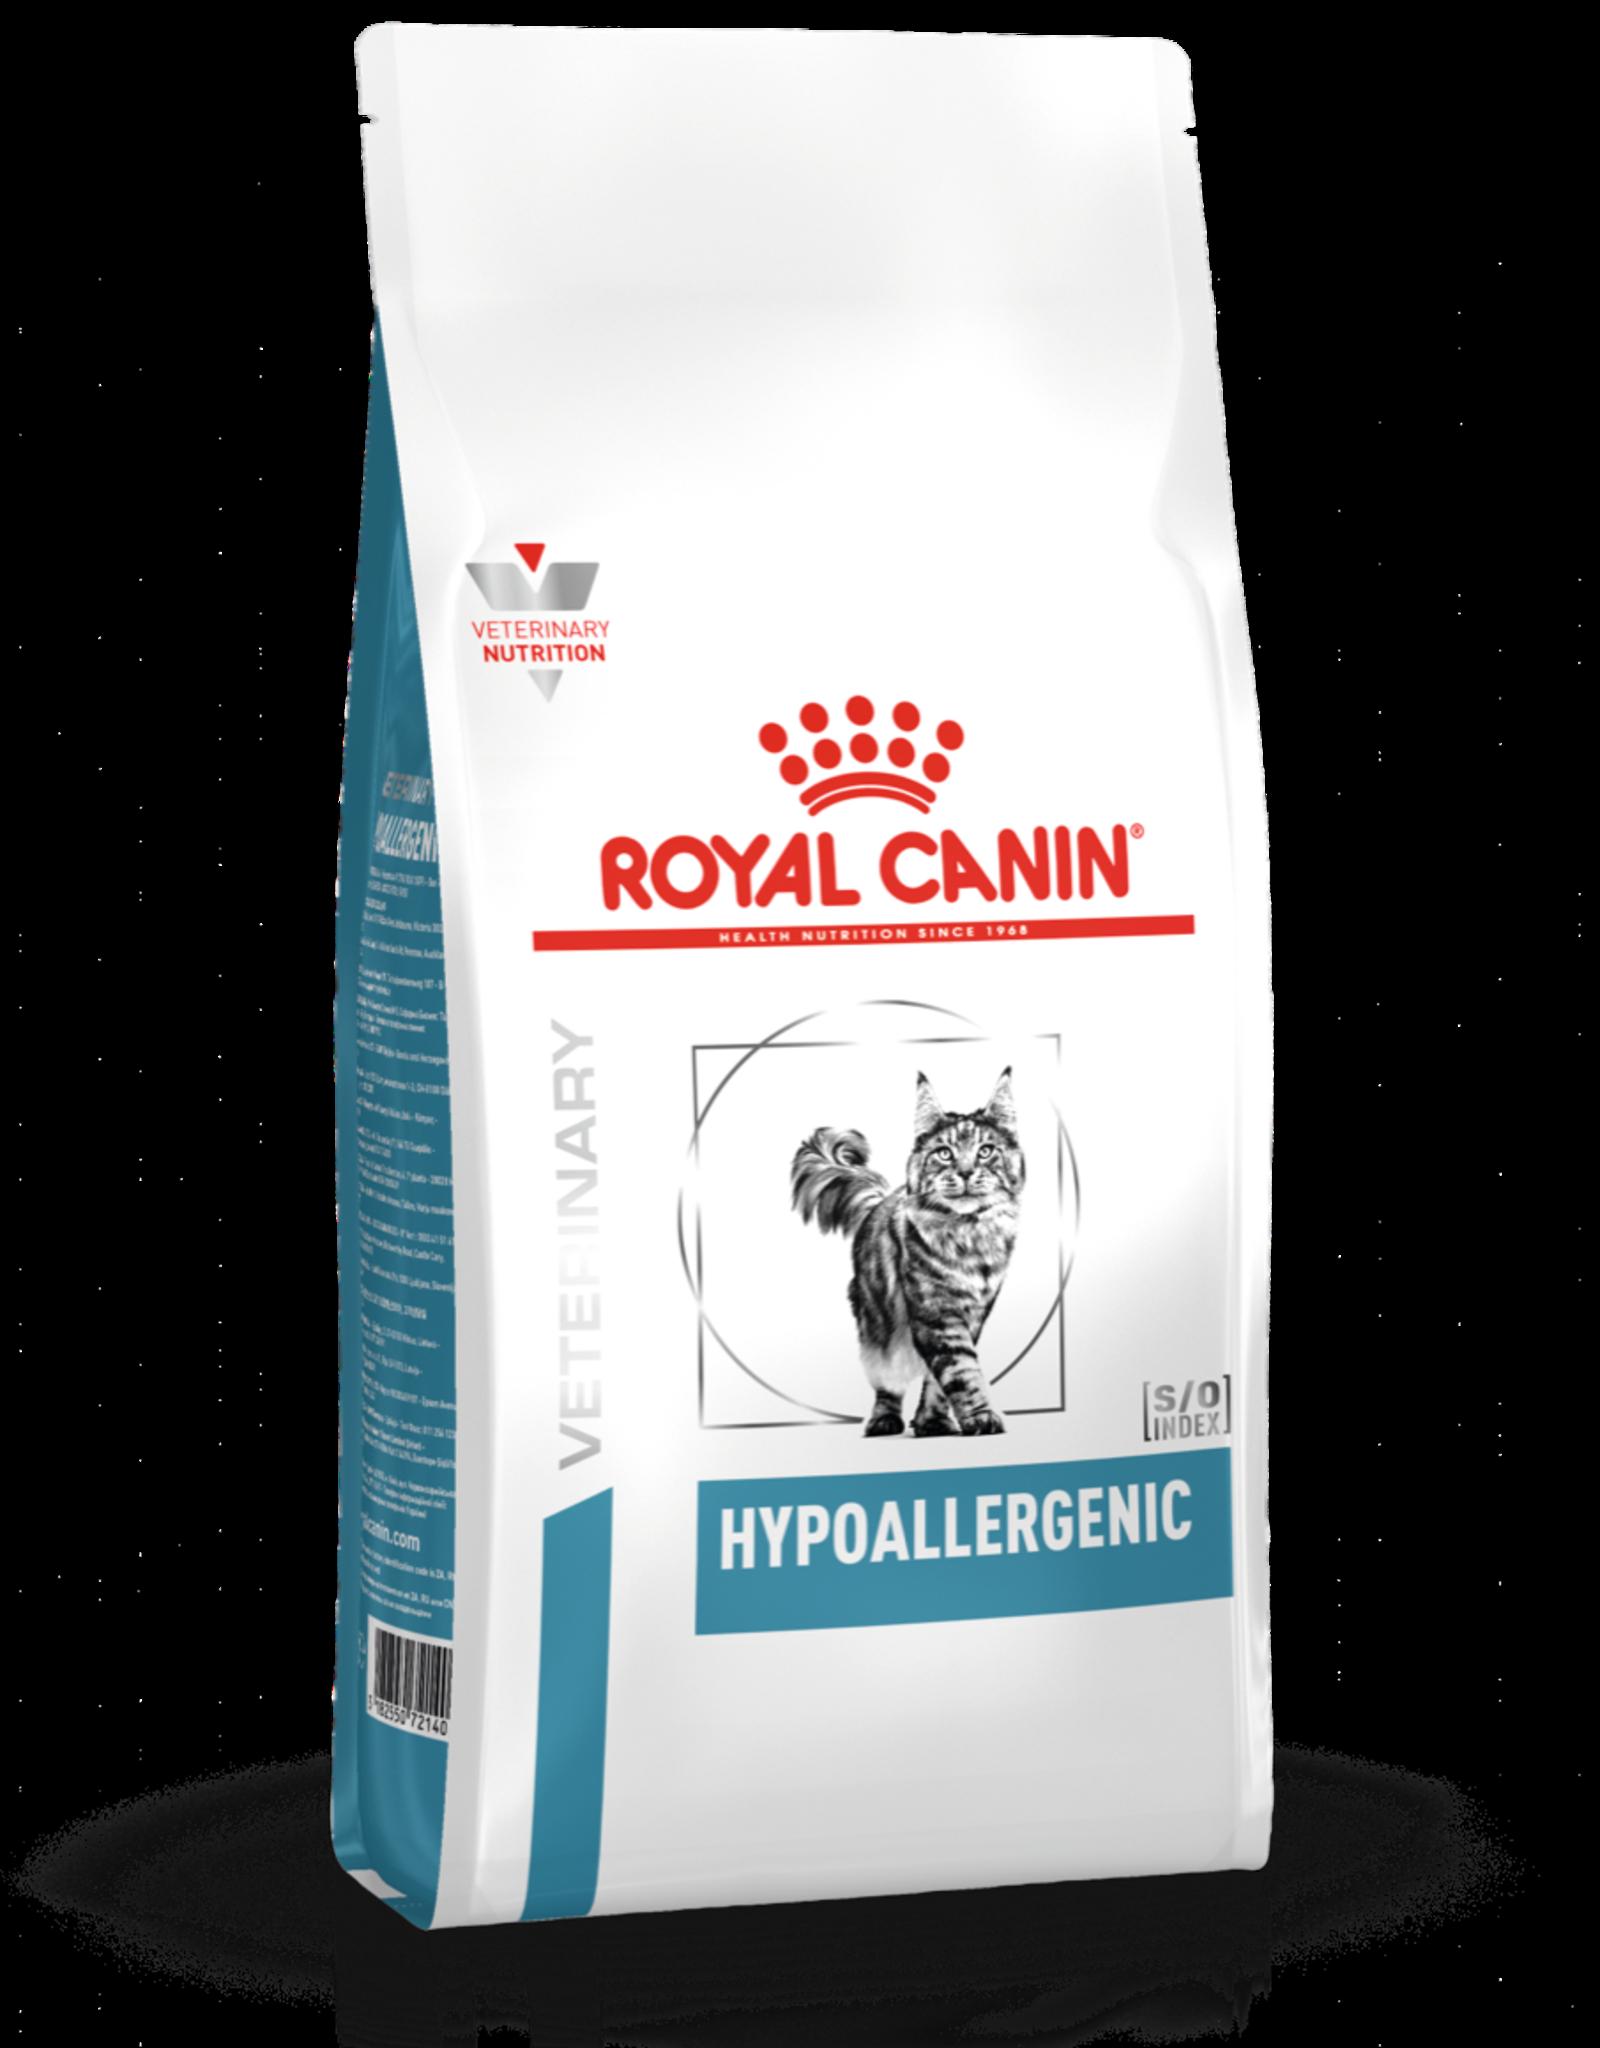 Royal Canin Royal Canin Hypoallergenic Katze 4,5kg